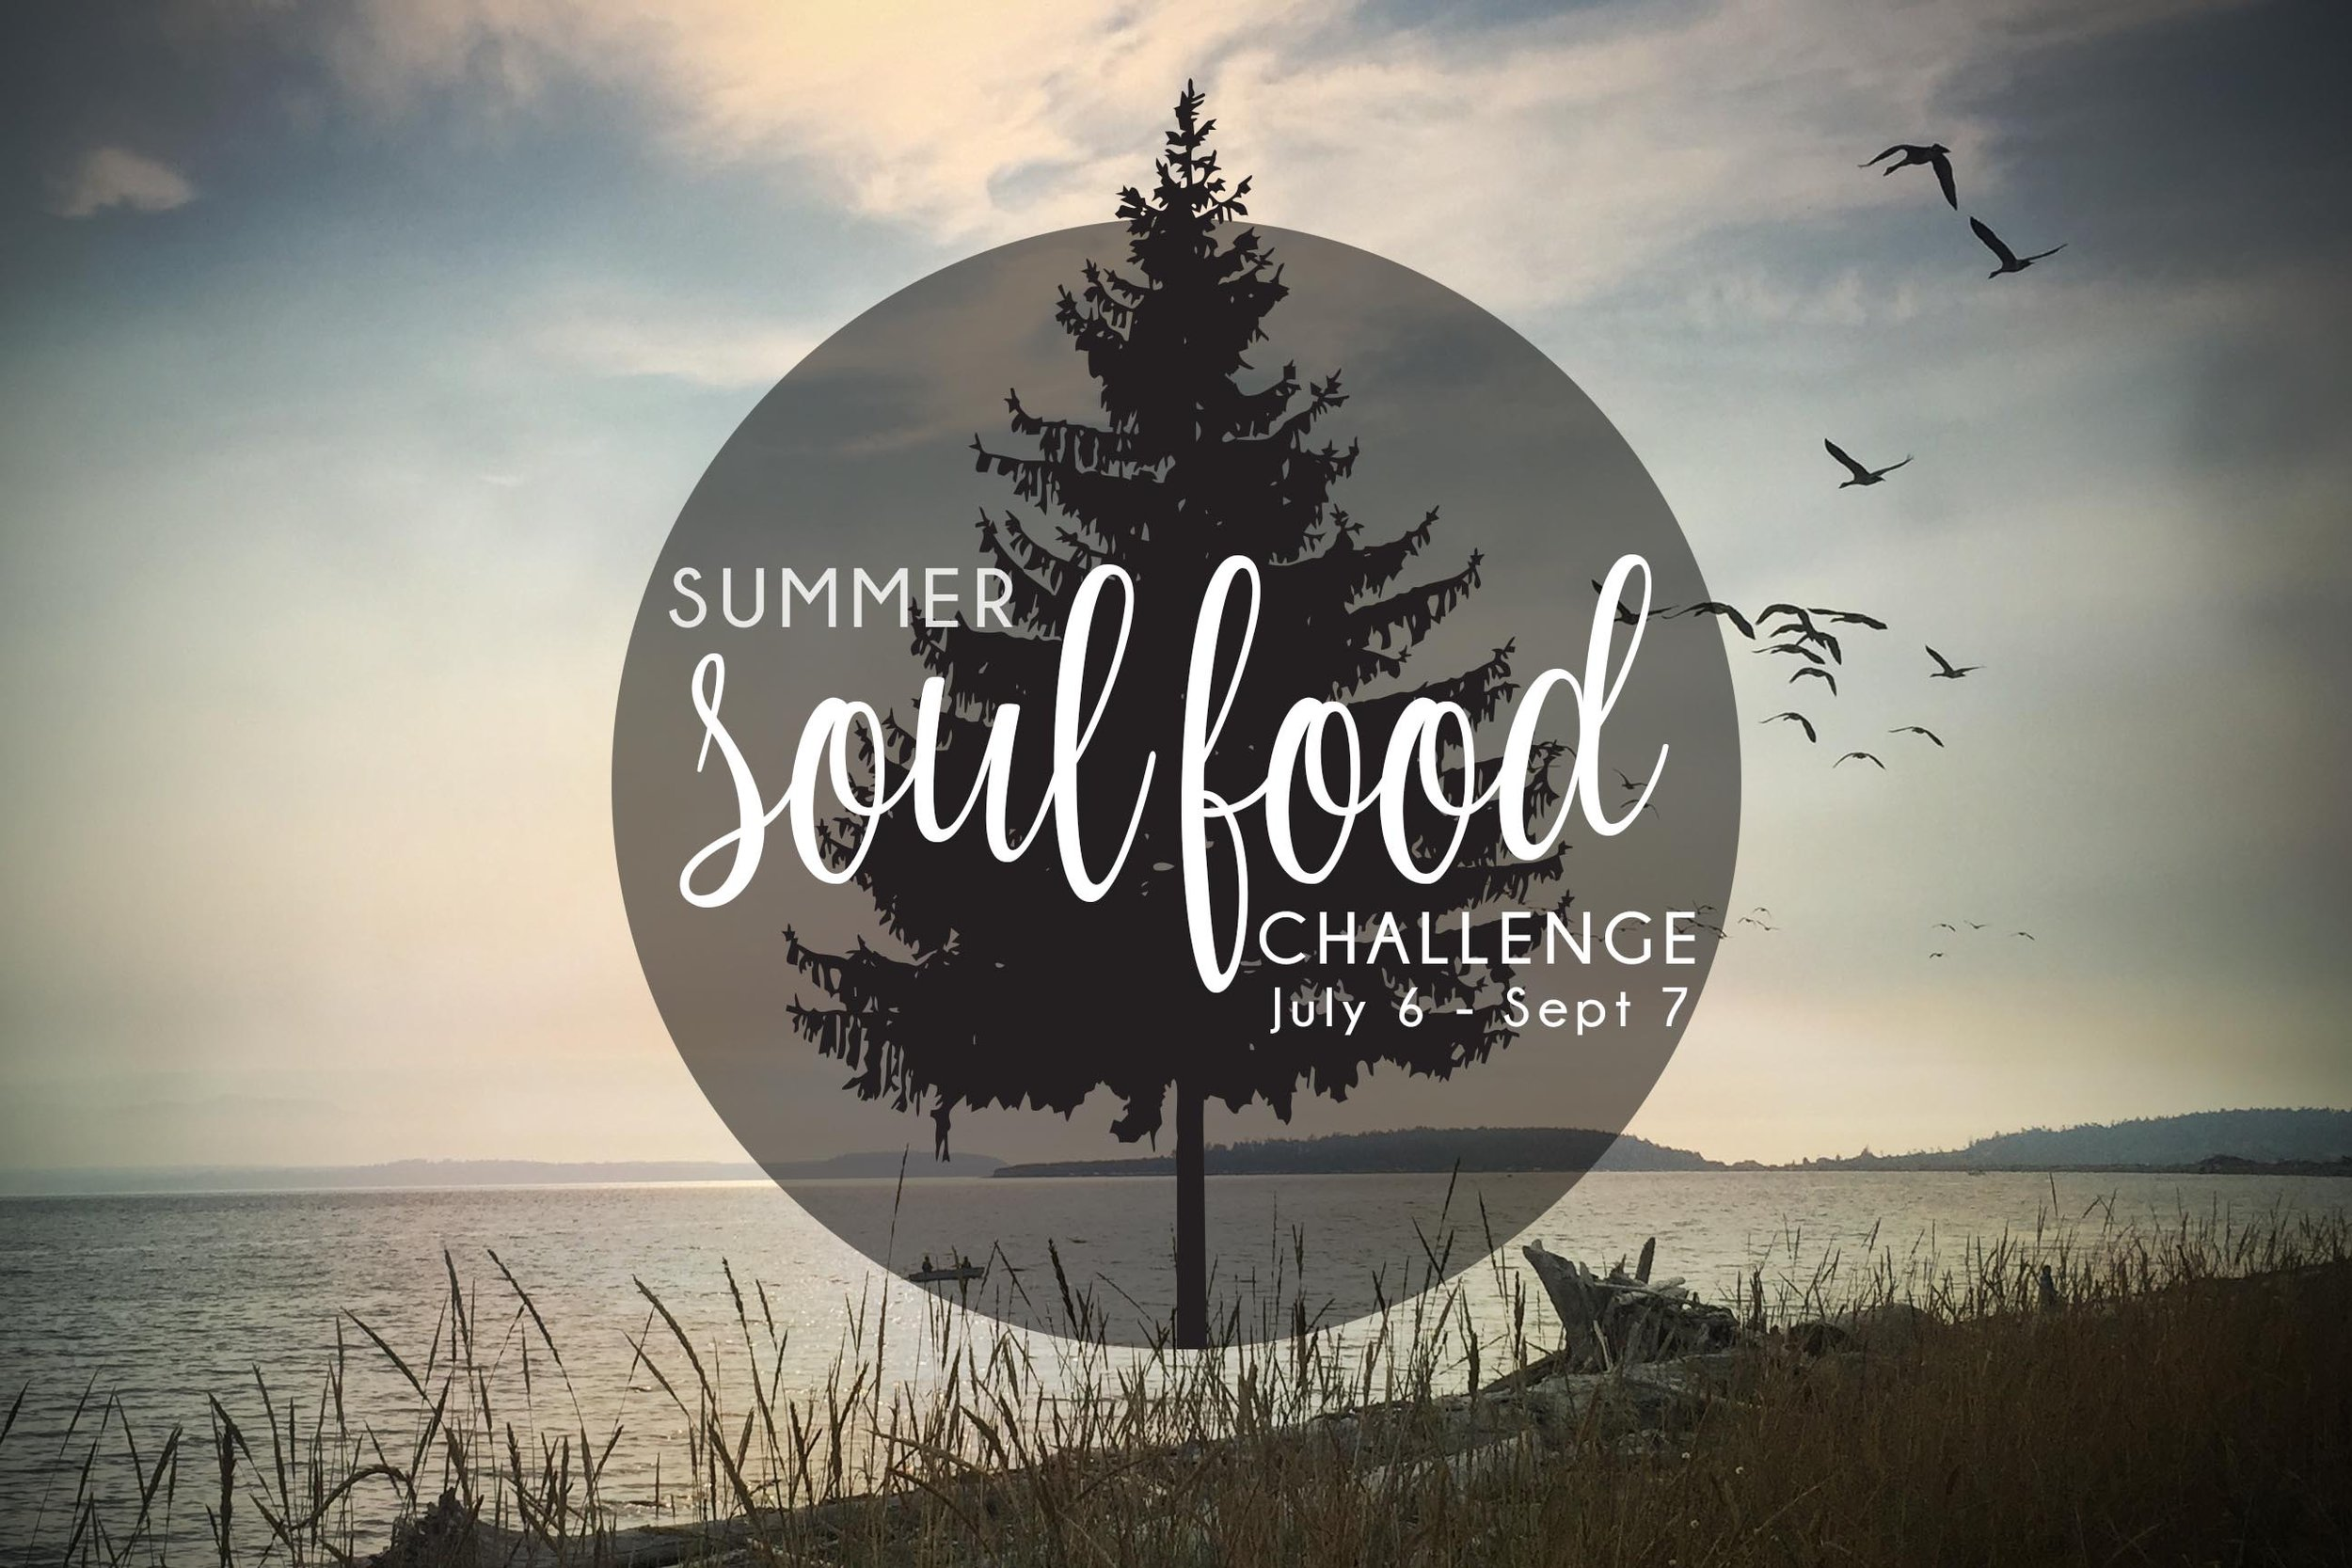 summer challenge 2019-1.jpeg